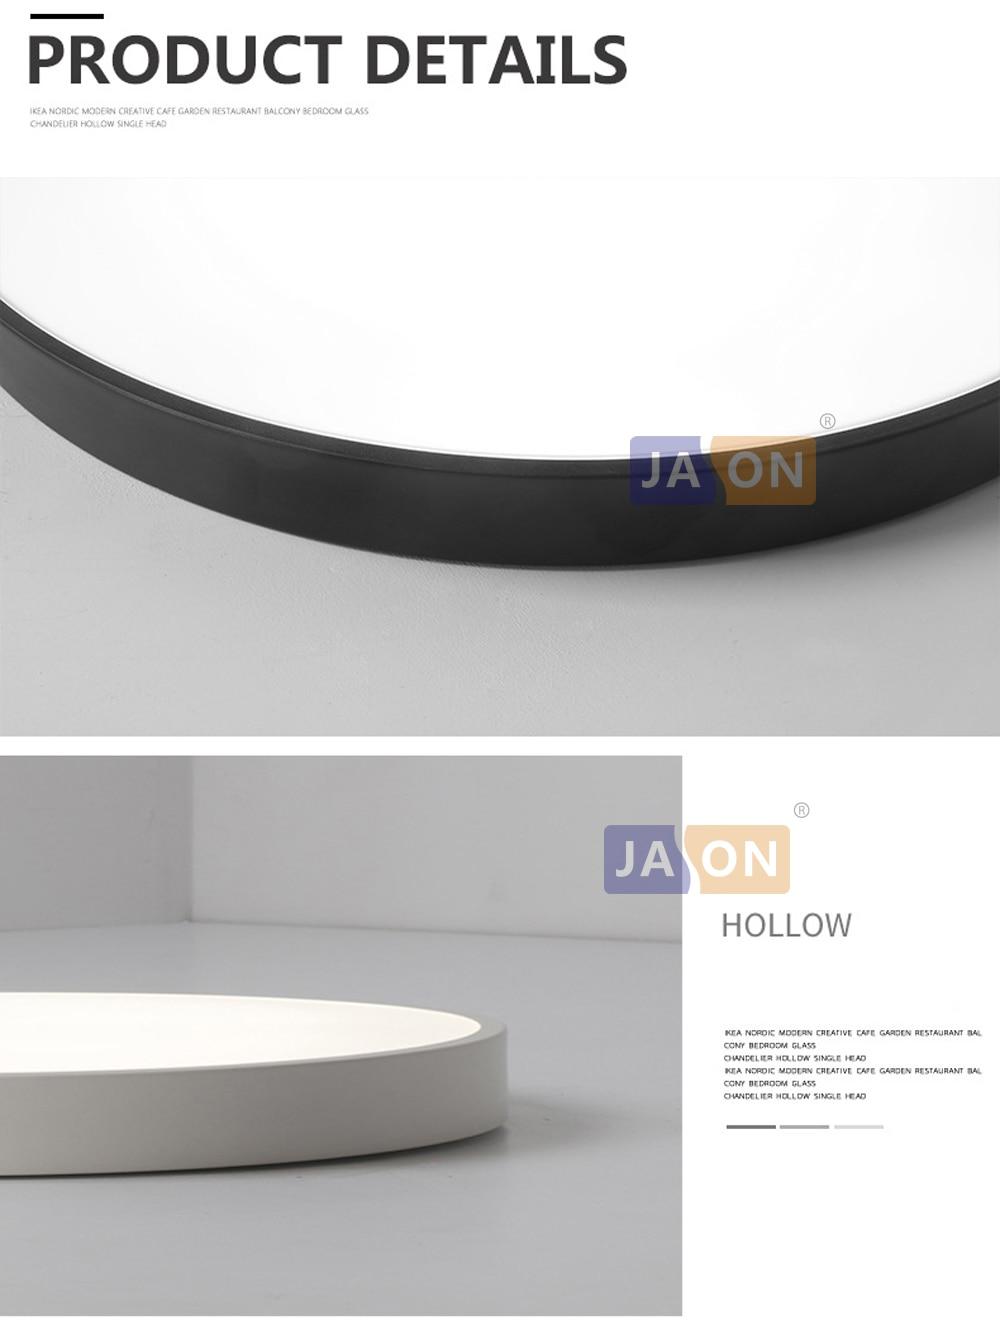 HTB16o96jgLD8KJjSszeq6yGRpXaE LED Modern Acryl Alloy Round 5cm Super Thin LED Lamp.LED Light.Ceiling Lights.LED Ceiling Light.Ceiling Lamp For Foyer Bedroom